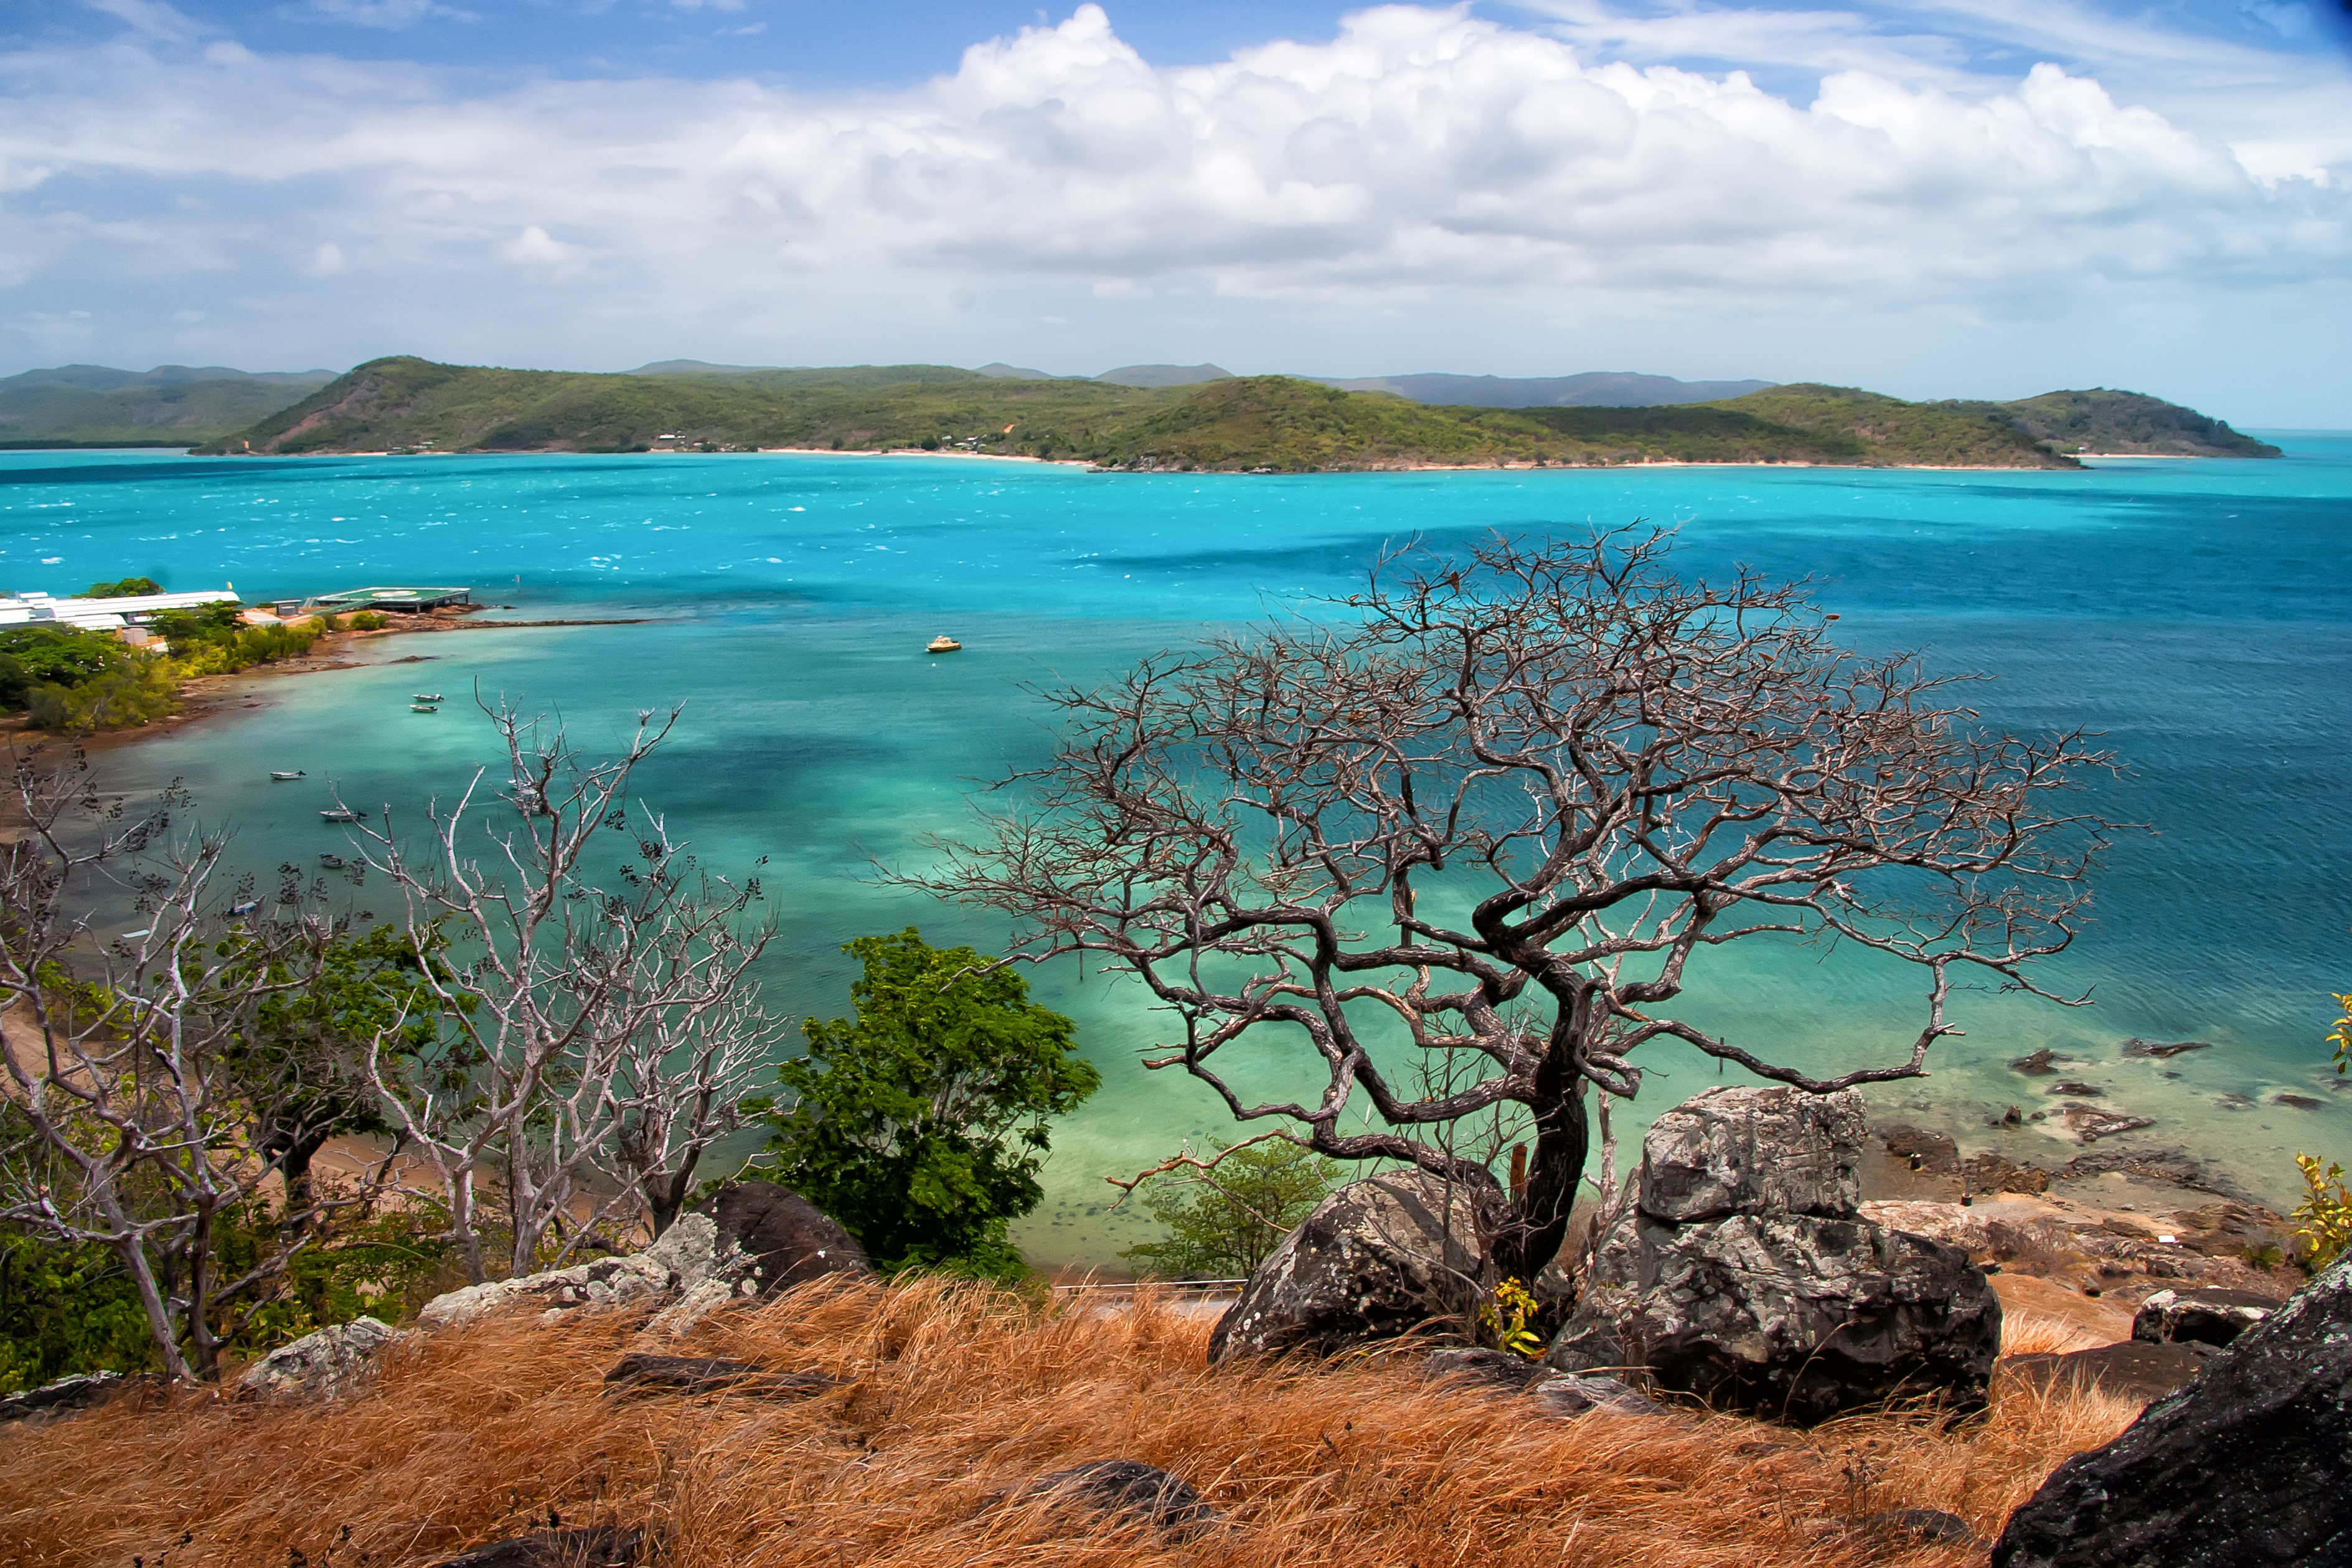 Turquoise hues of Thursday Island